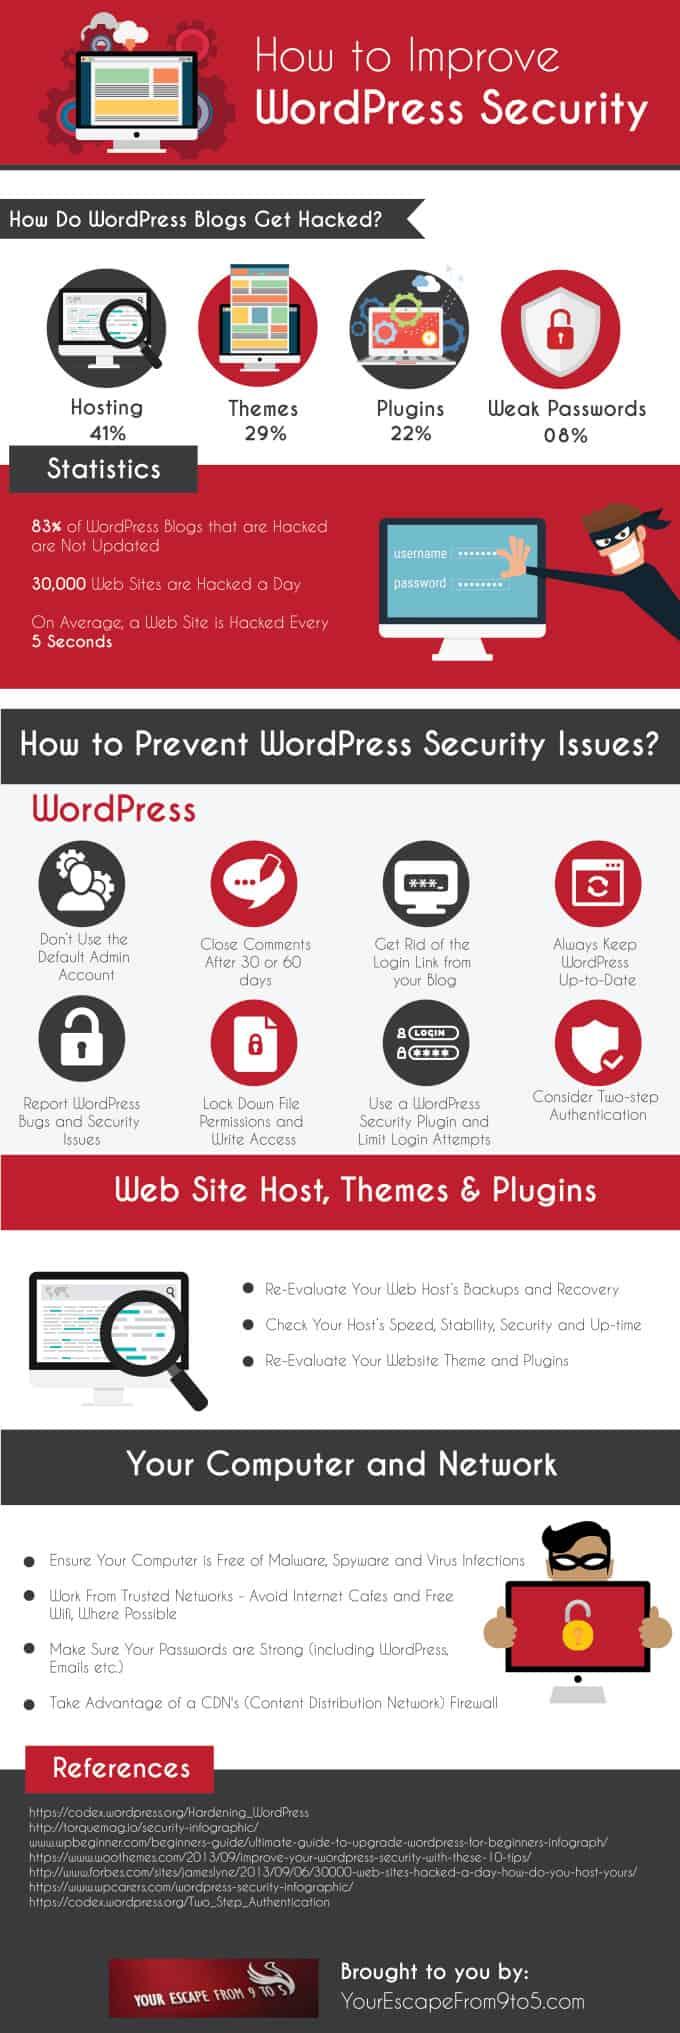 How to Improve WordPress Security Infographic.jpg-e1457572570696